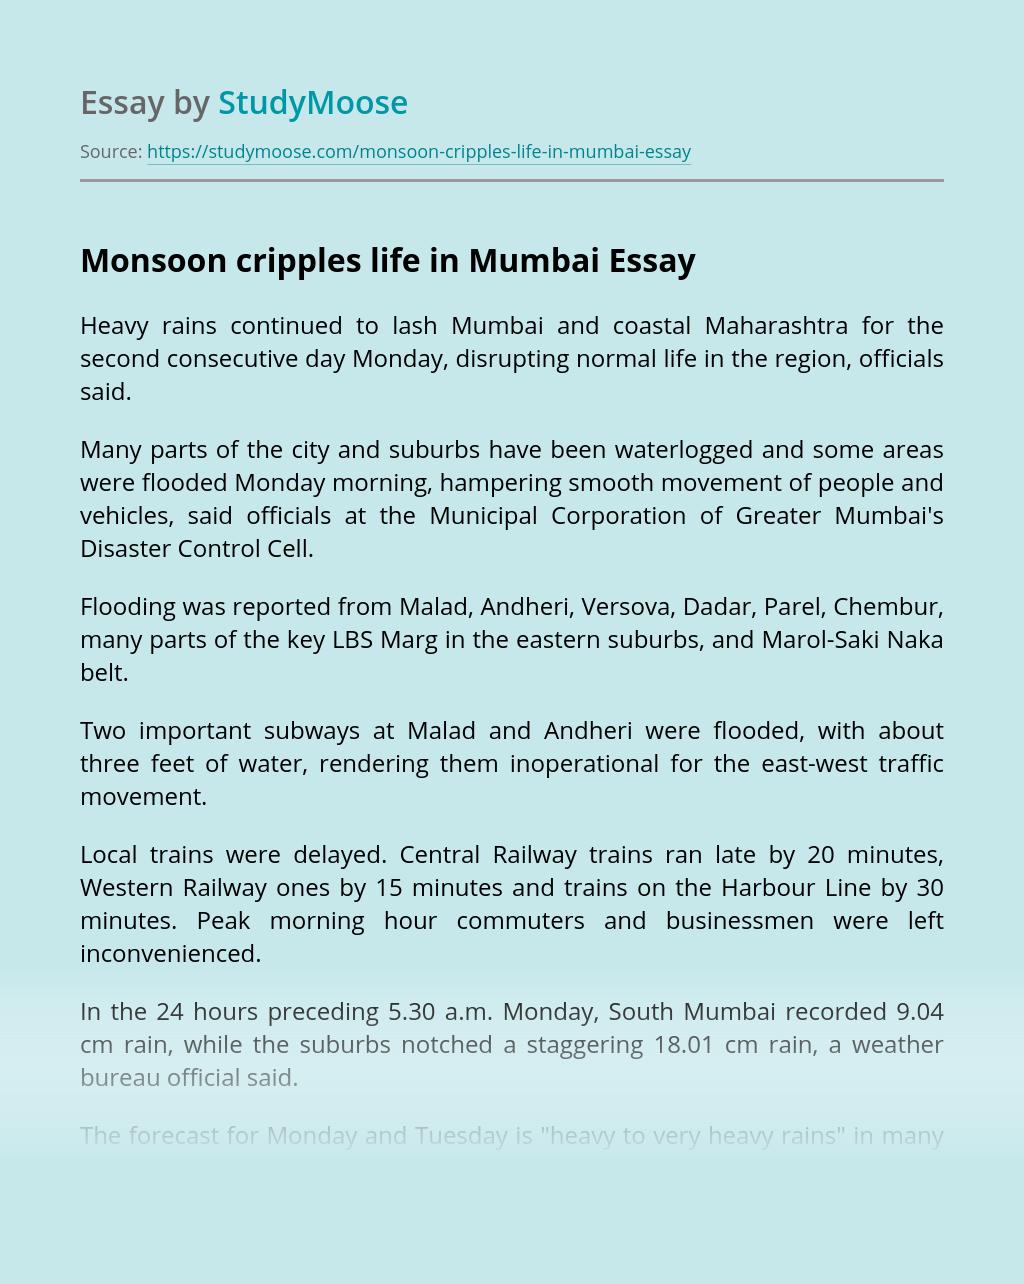 Monsoon cripples life in Mumbai